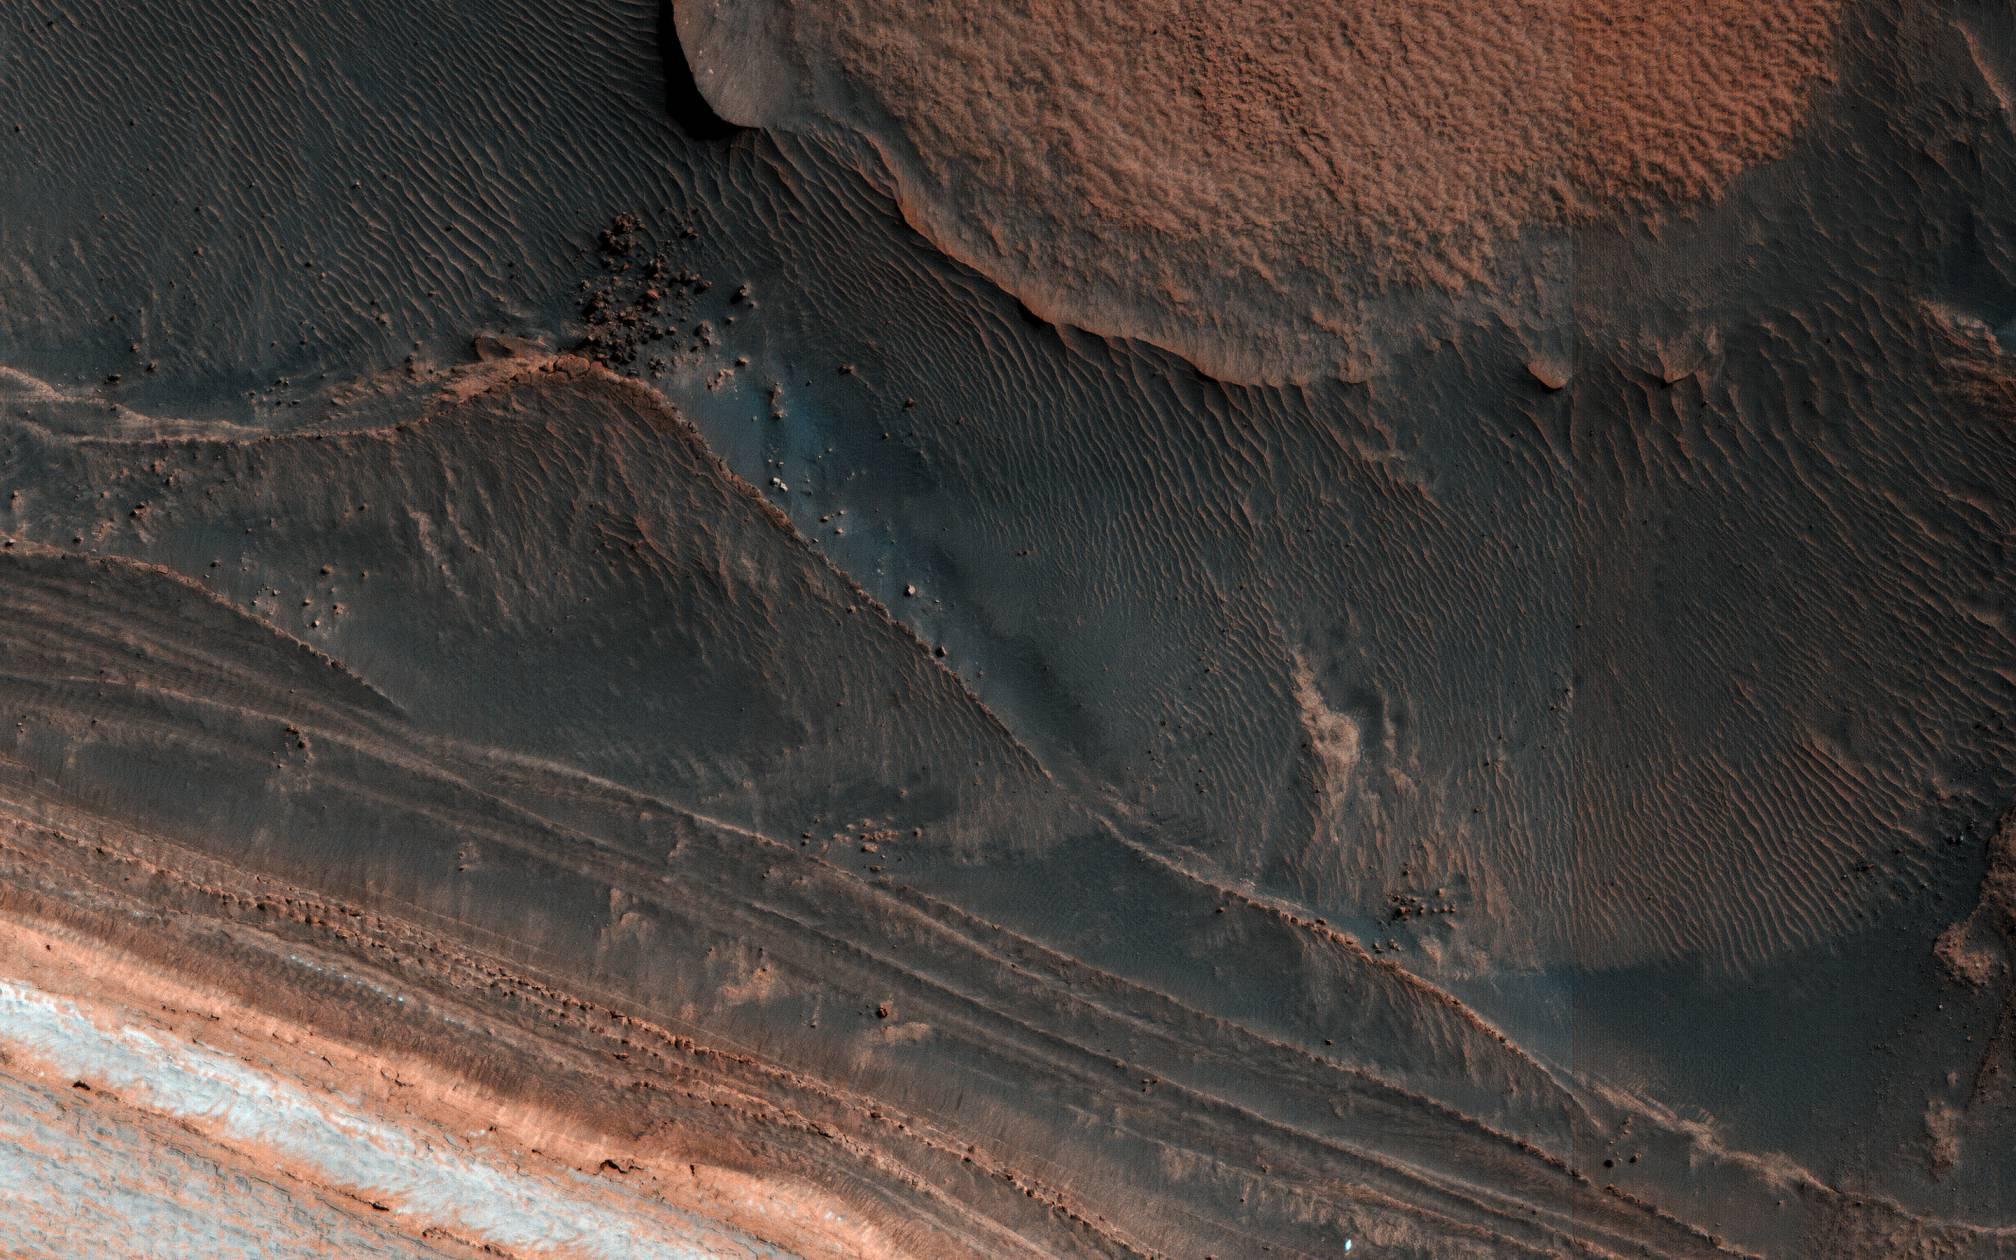 Ice Block Avalanche April 2018 (HiRISE)